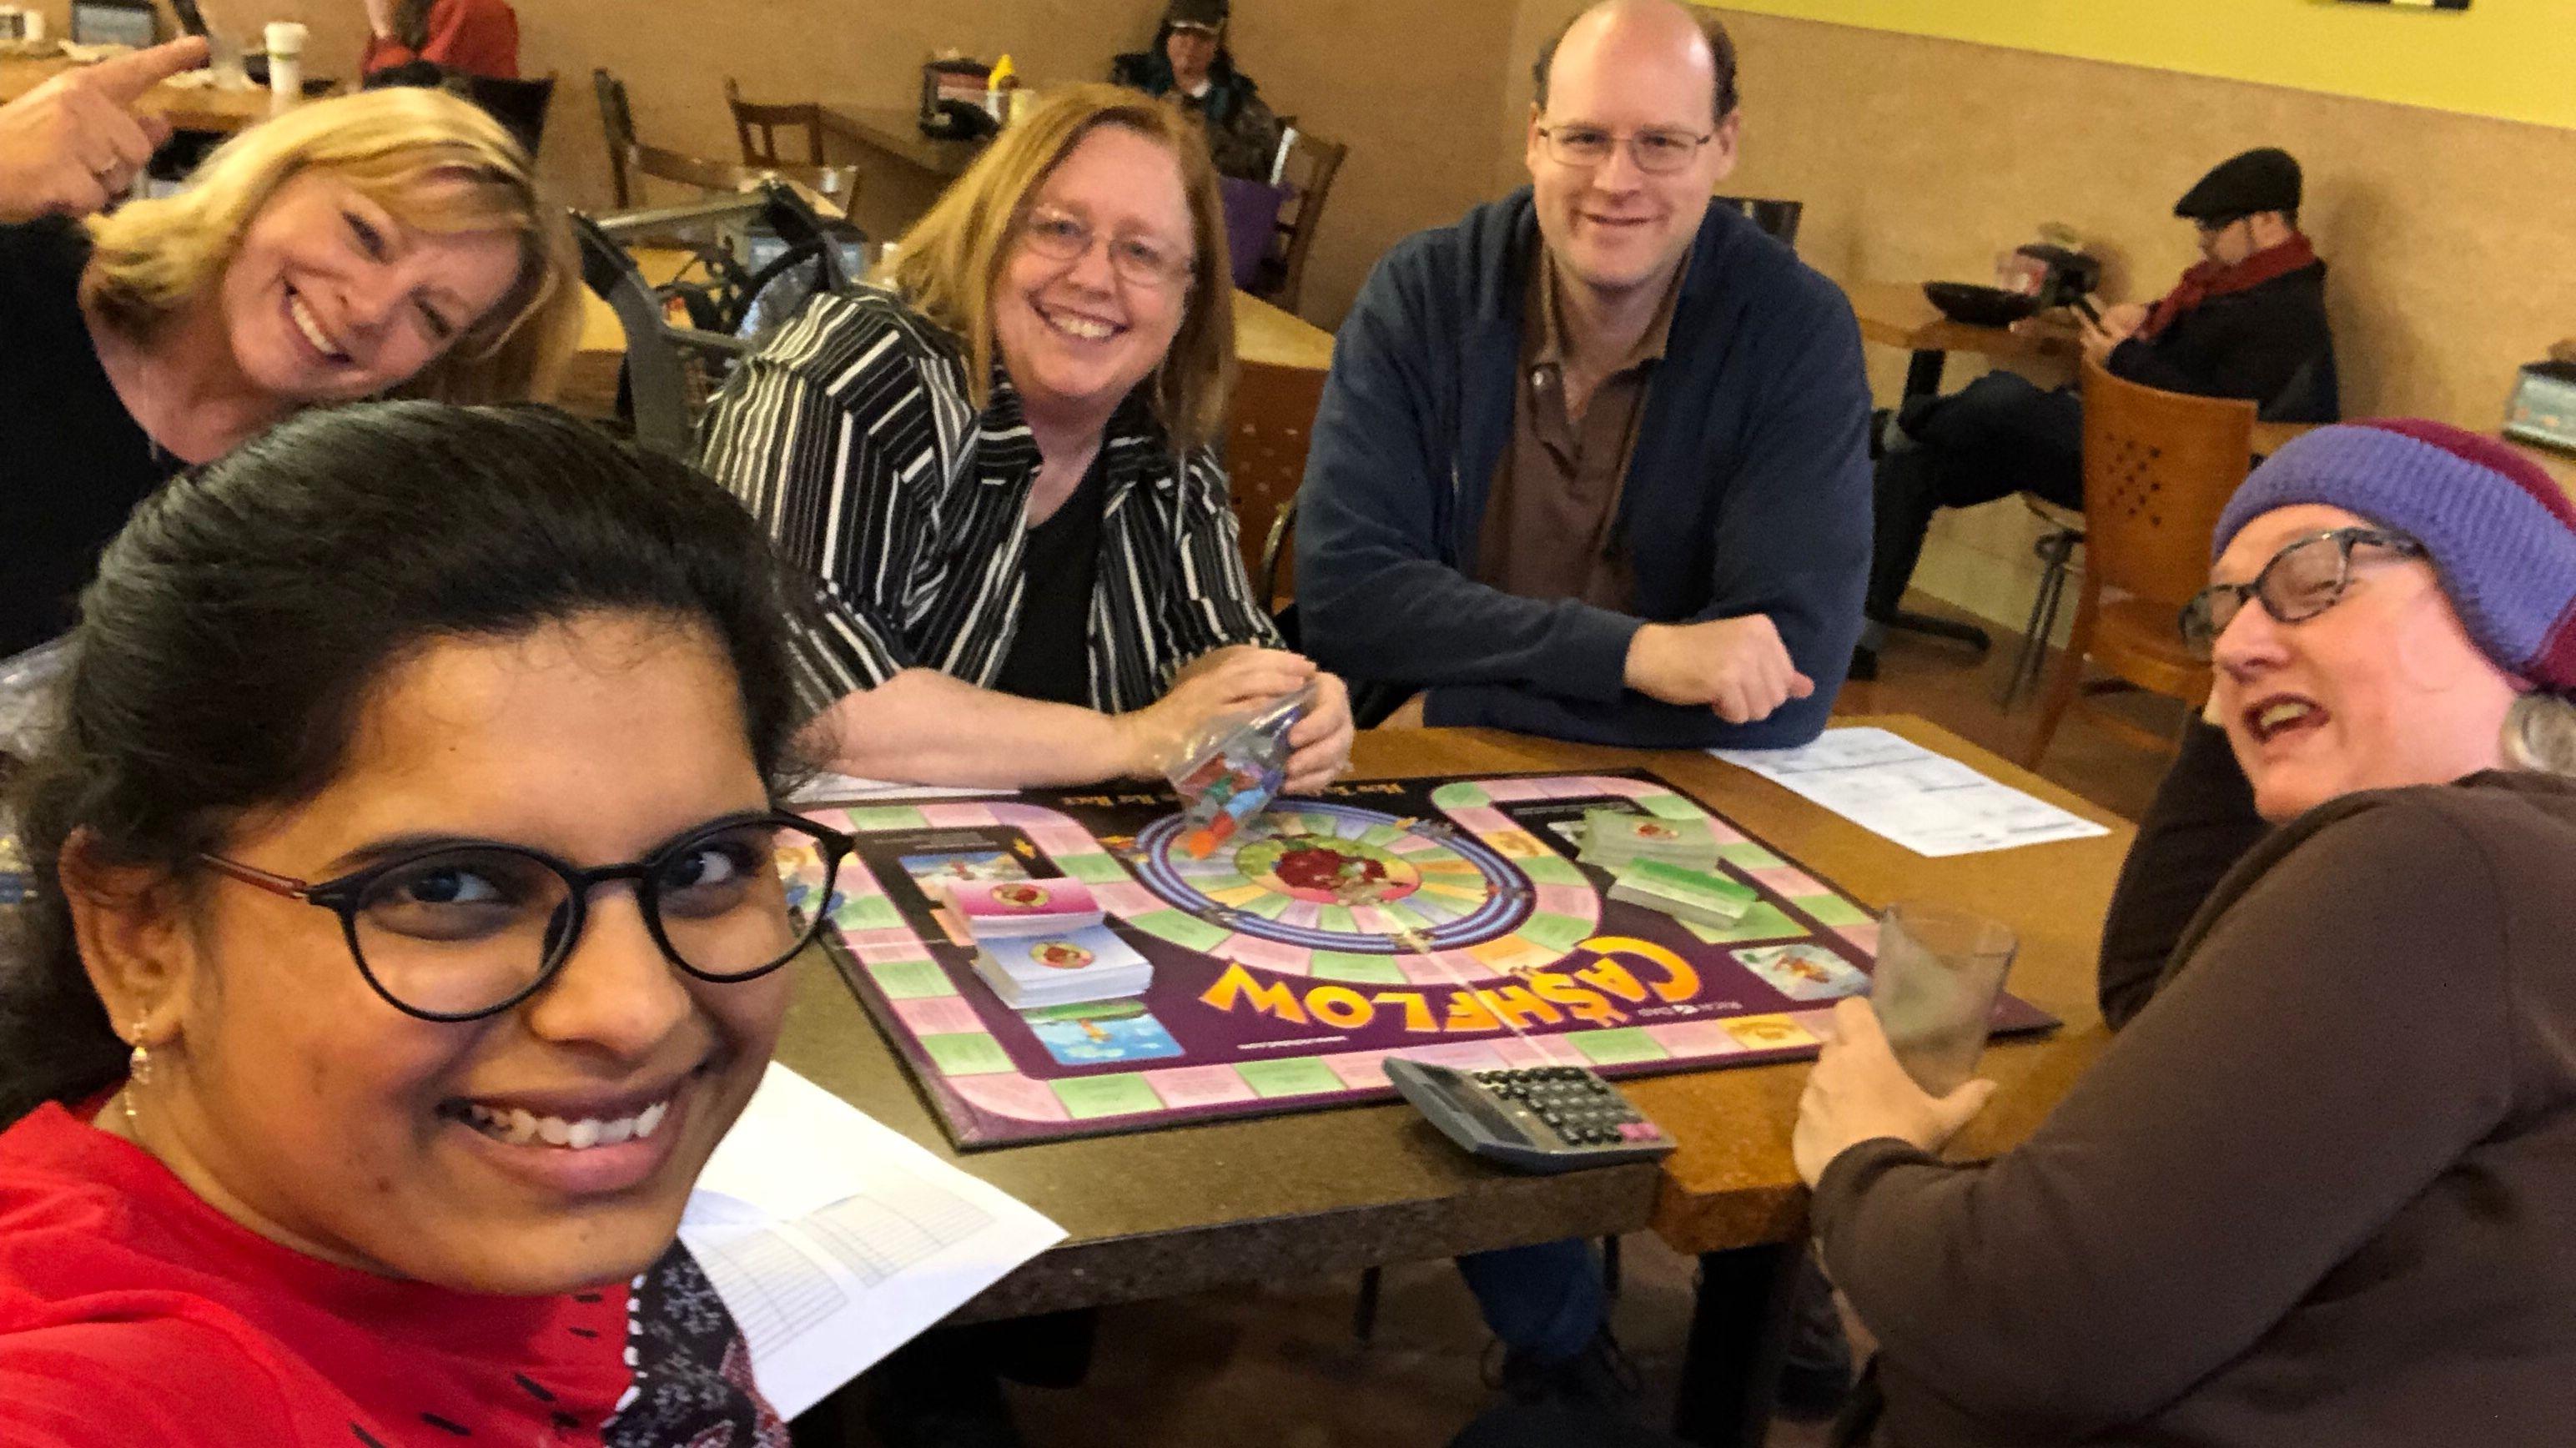 The Portland Cashflow Meetup Group